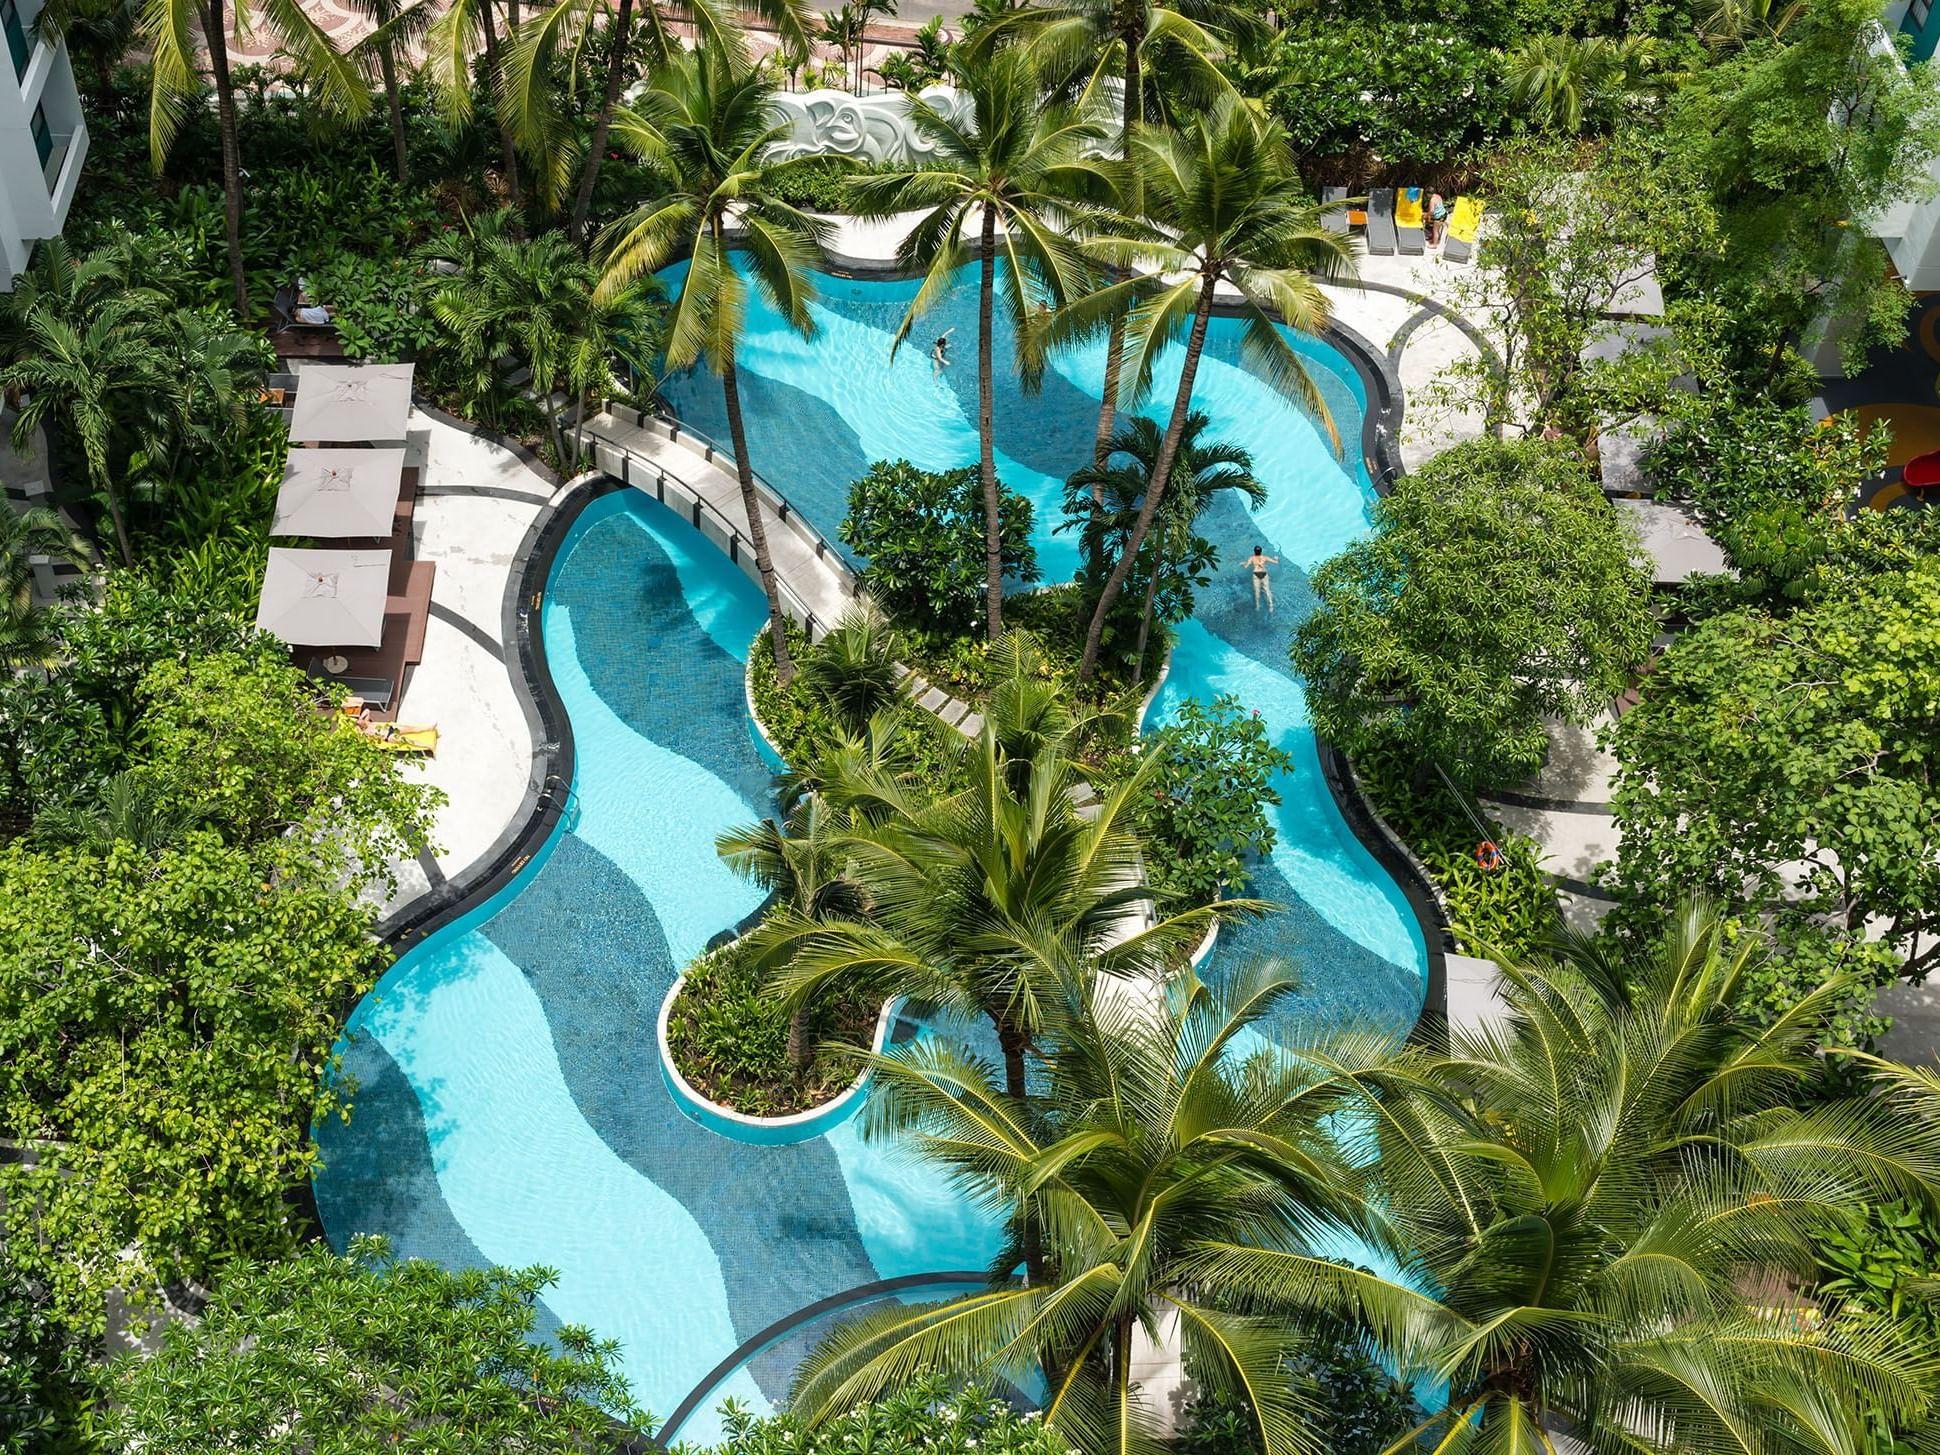 Ariel view of pool at Chatrium Residence Sathon Bangkok